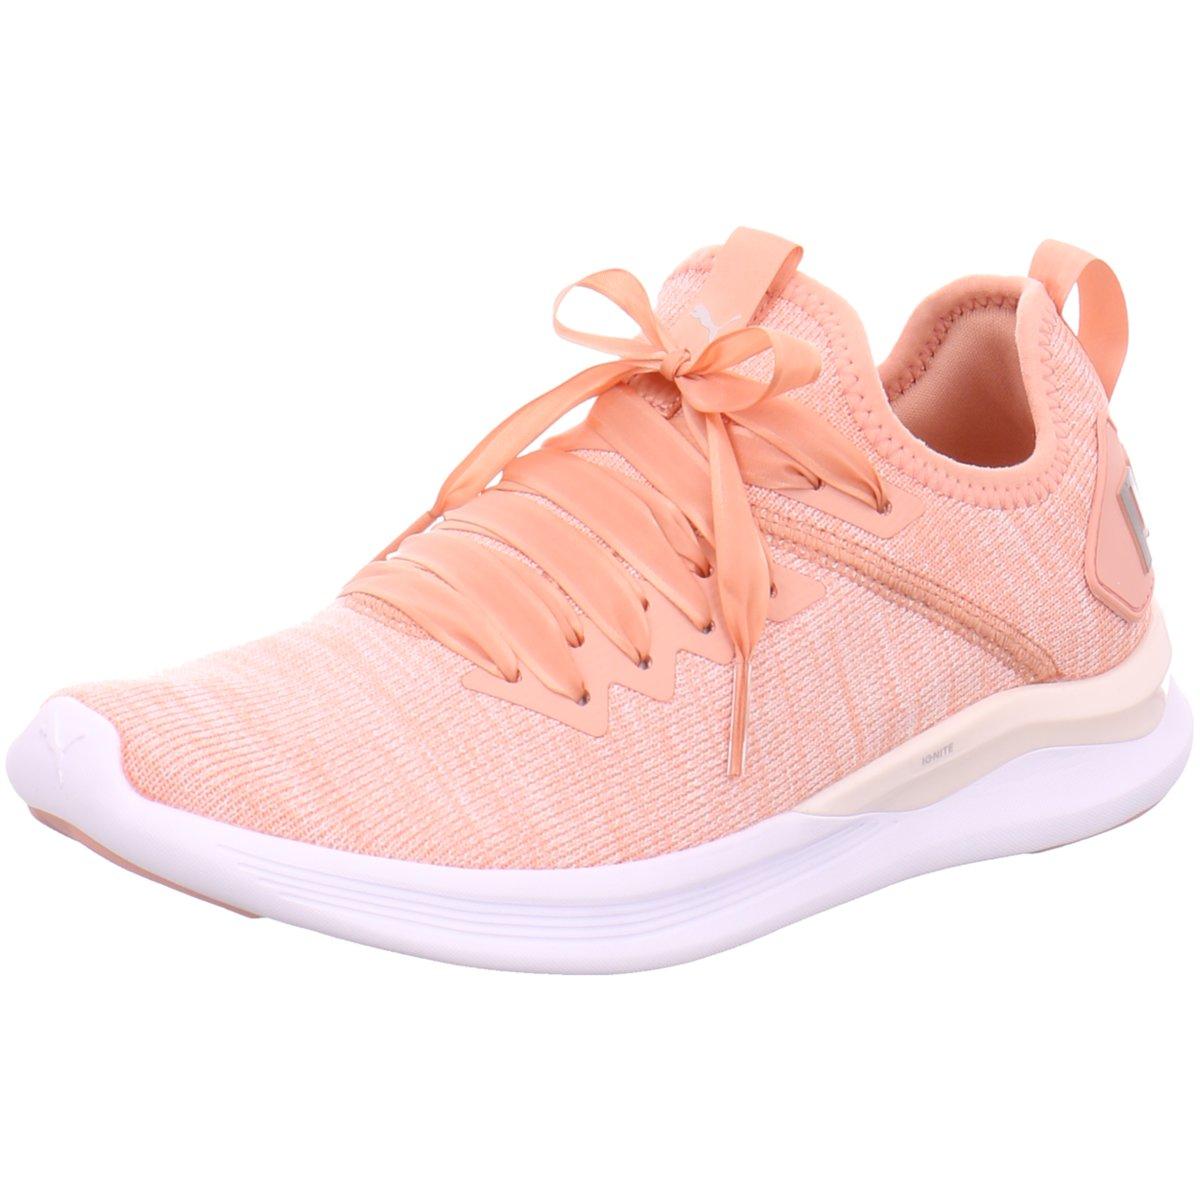 check out 258ad 8d6c7 Details zu #S2K Puma Damen Sneaker IGNITE FLASH EVOKNIT SATIN EP WN'S  190959-002 rosa